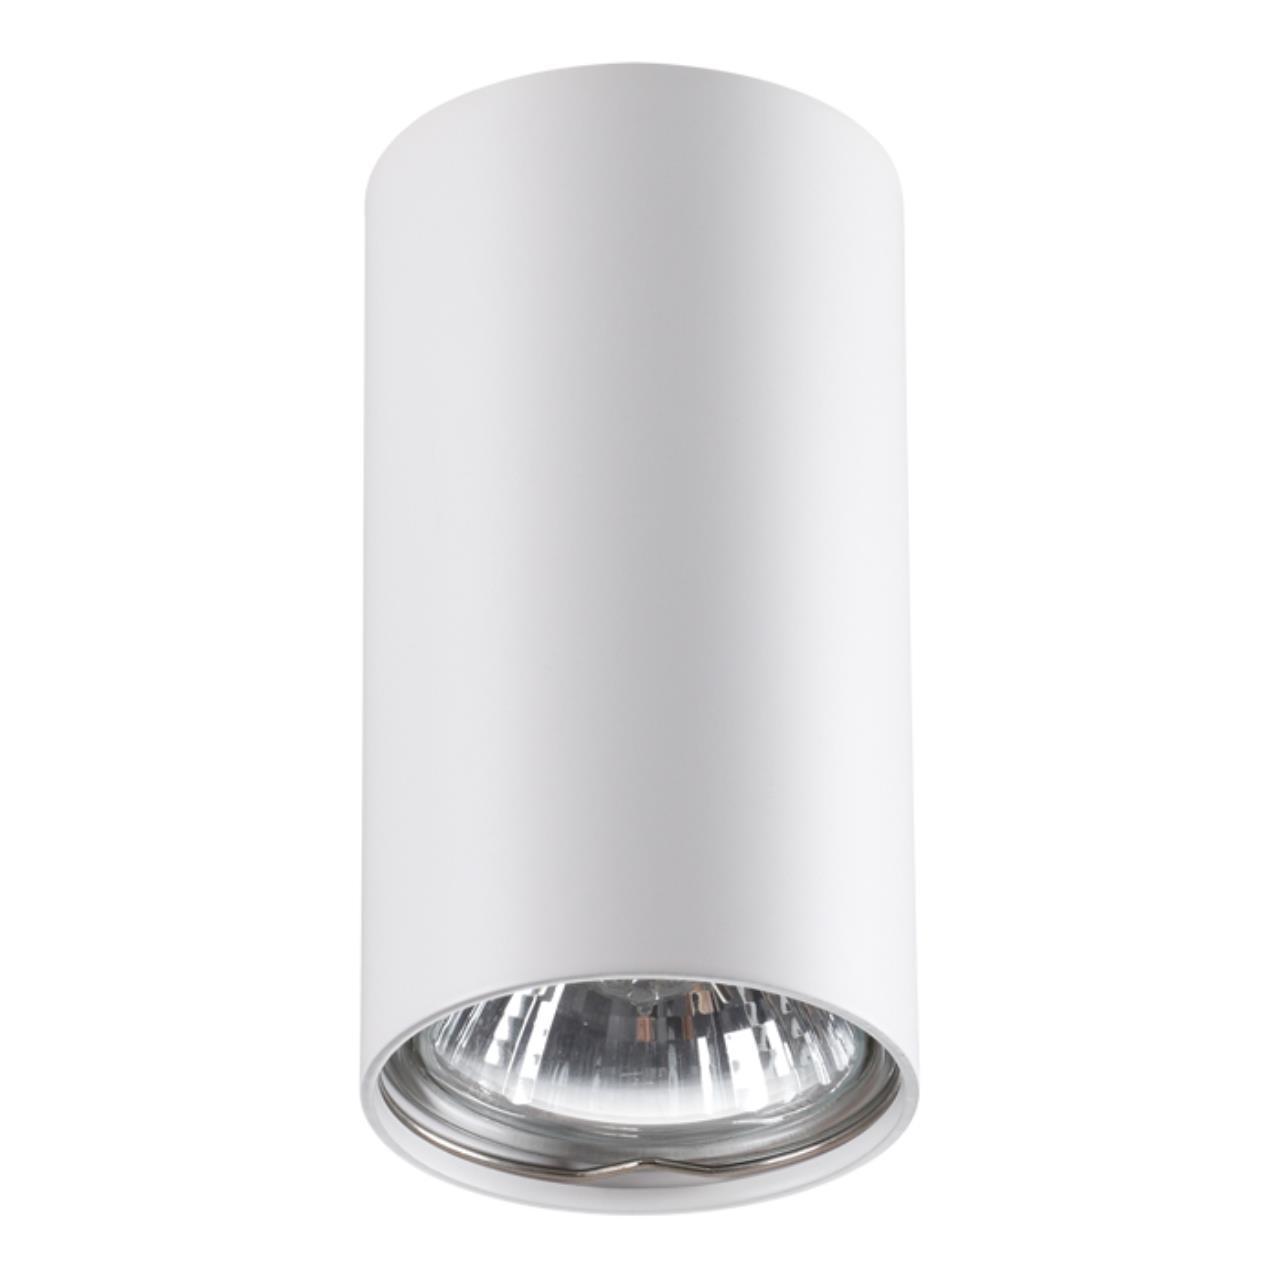 370399 OVER NT18 101 белый Накладной светильник IP20 GU10 50W 220V PIPE